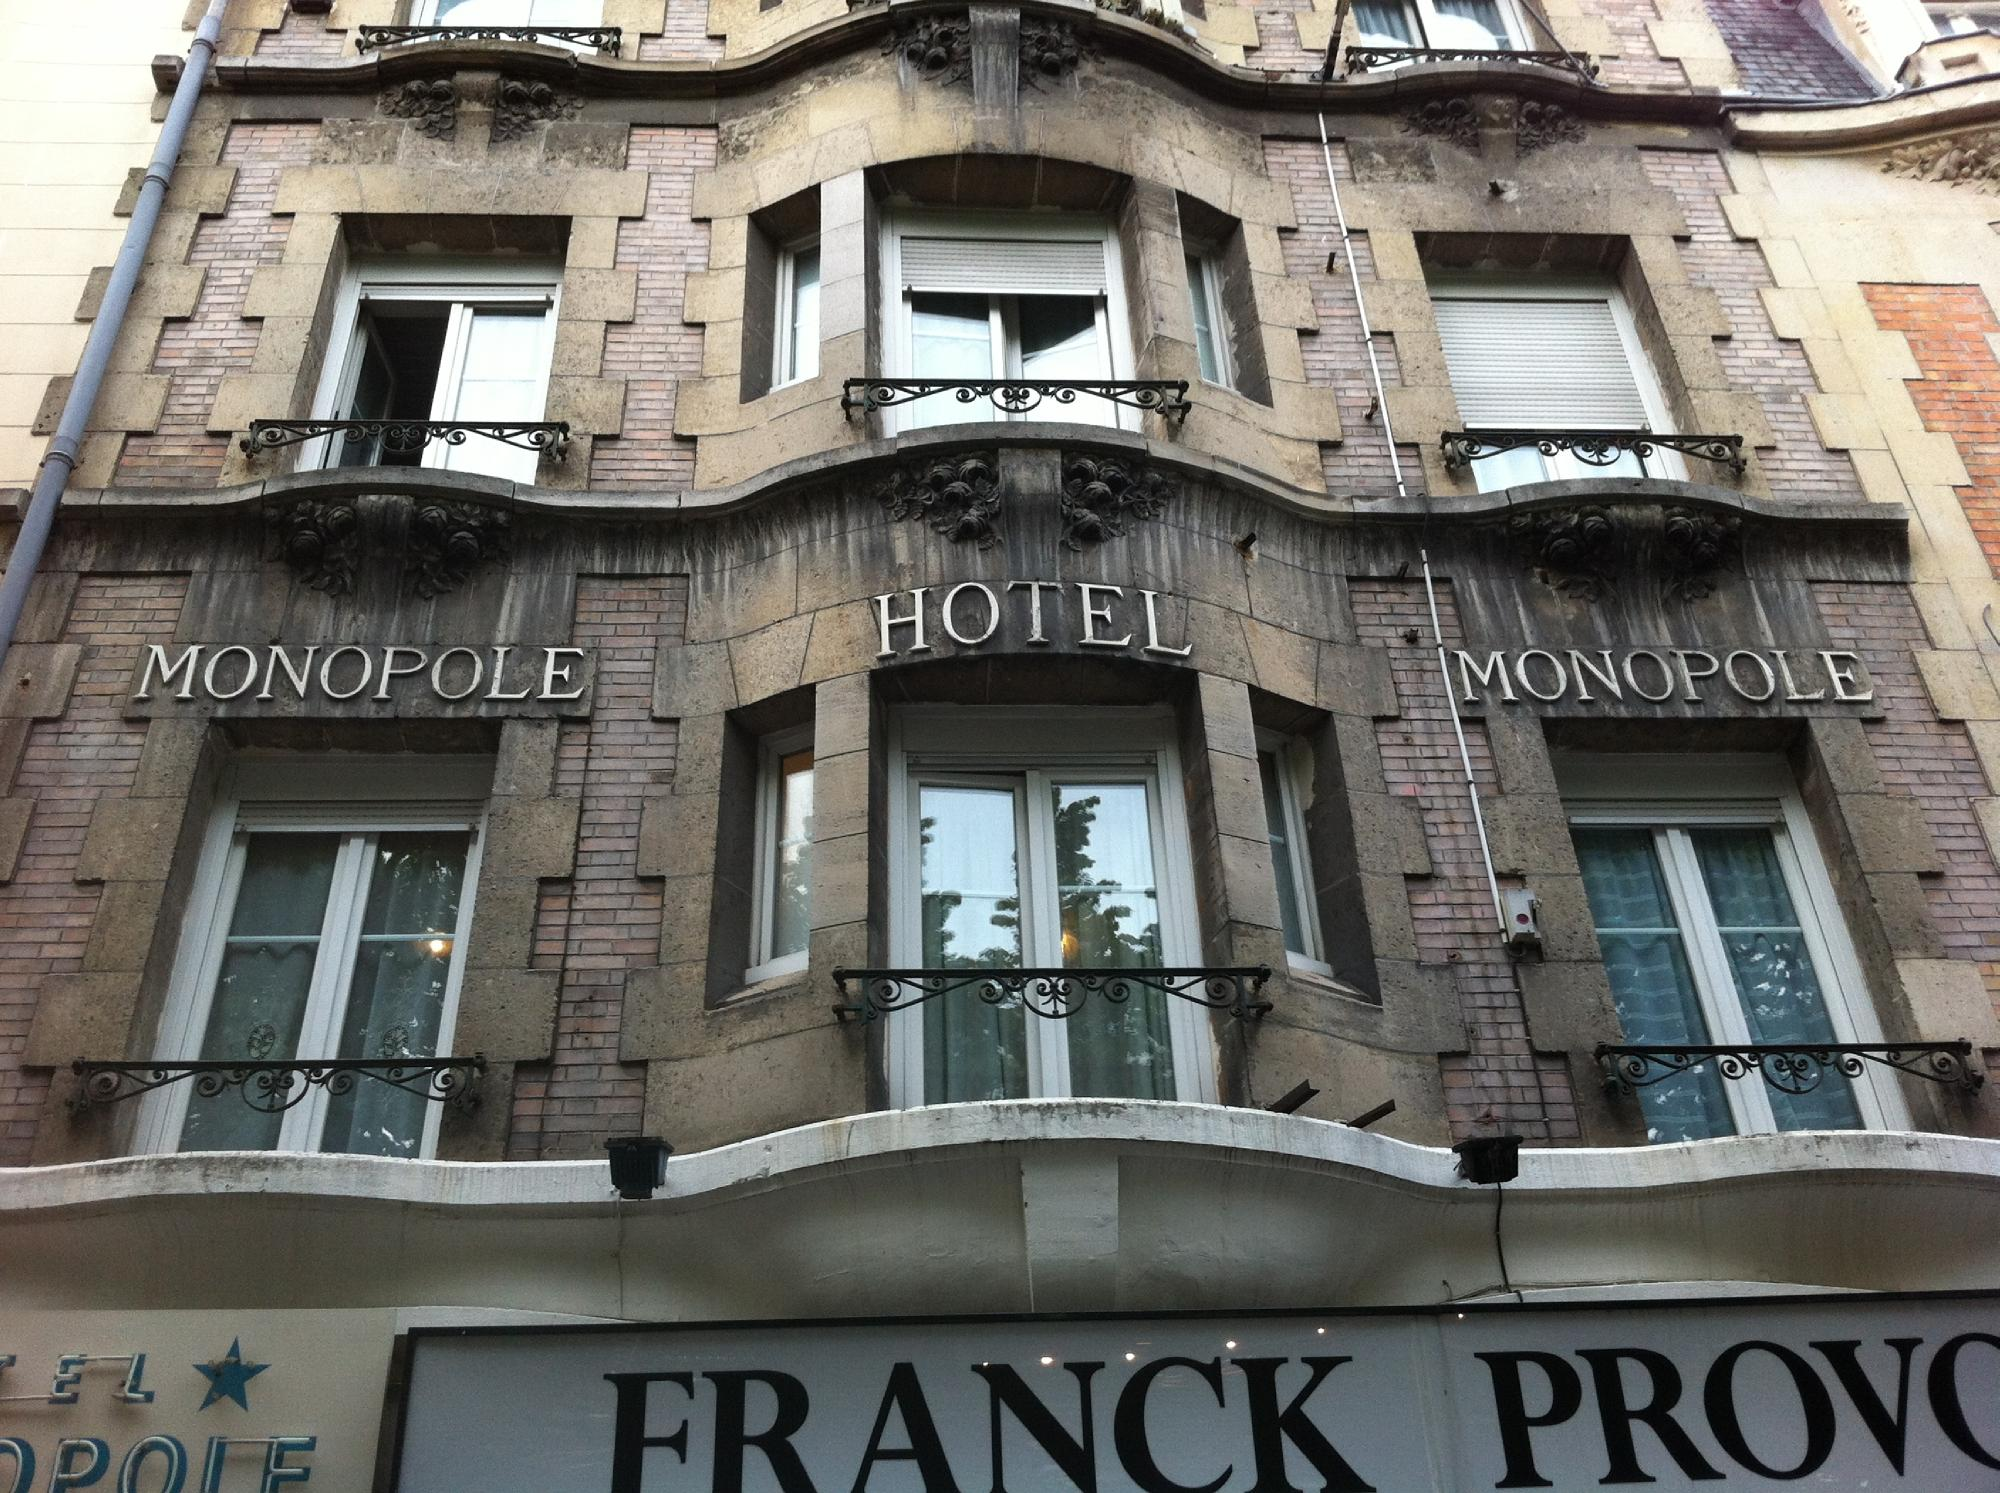 Hotel Le Monopole